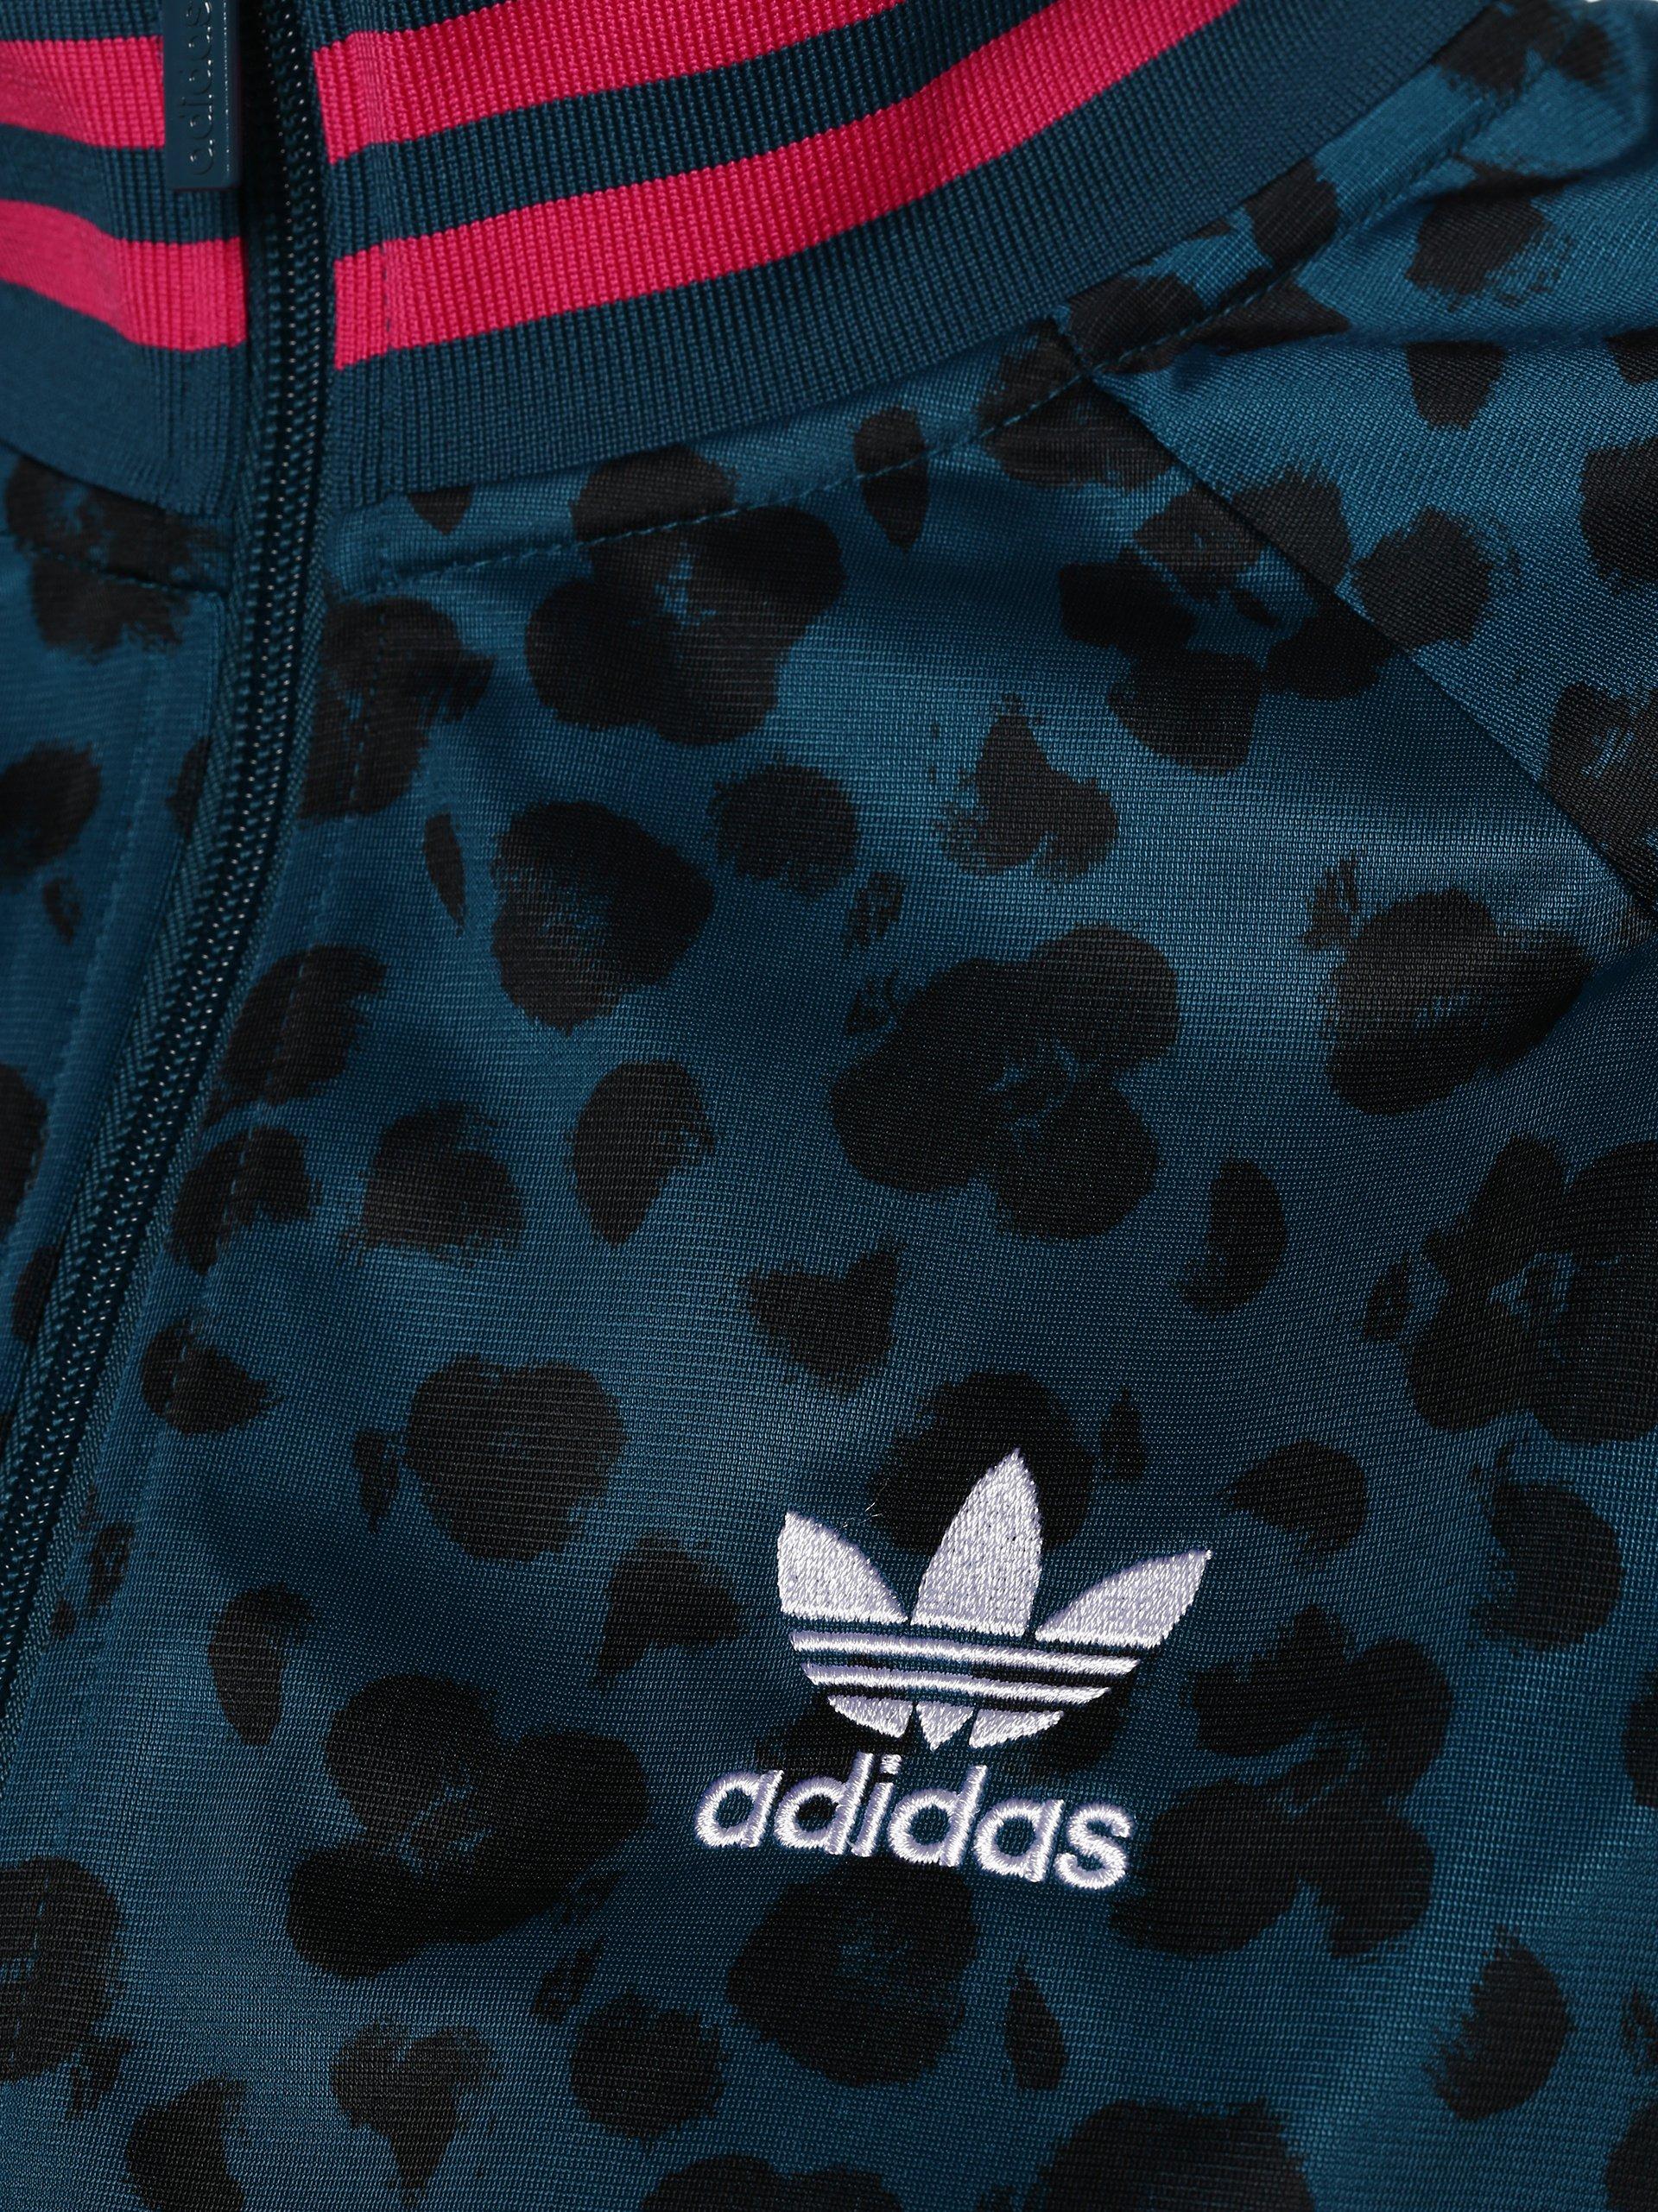 adidas Originals Damska bluza rozpinana